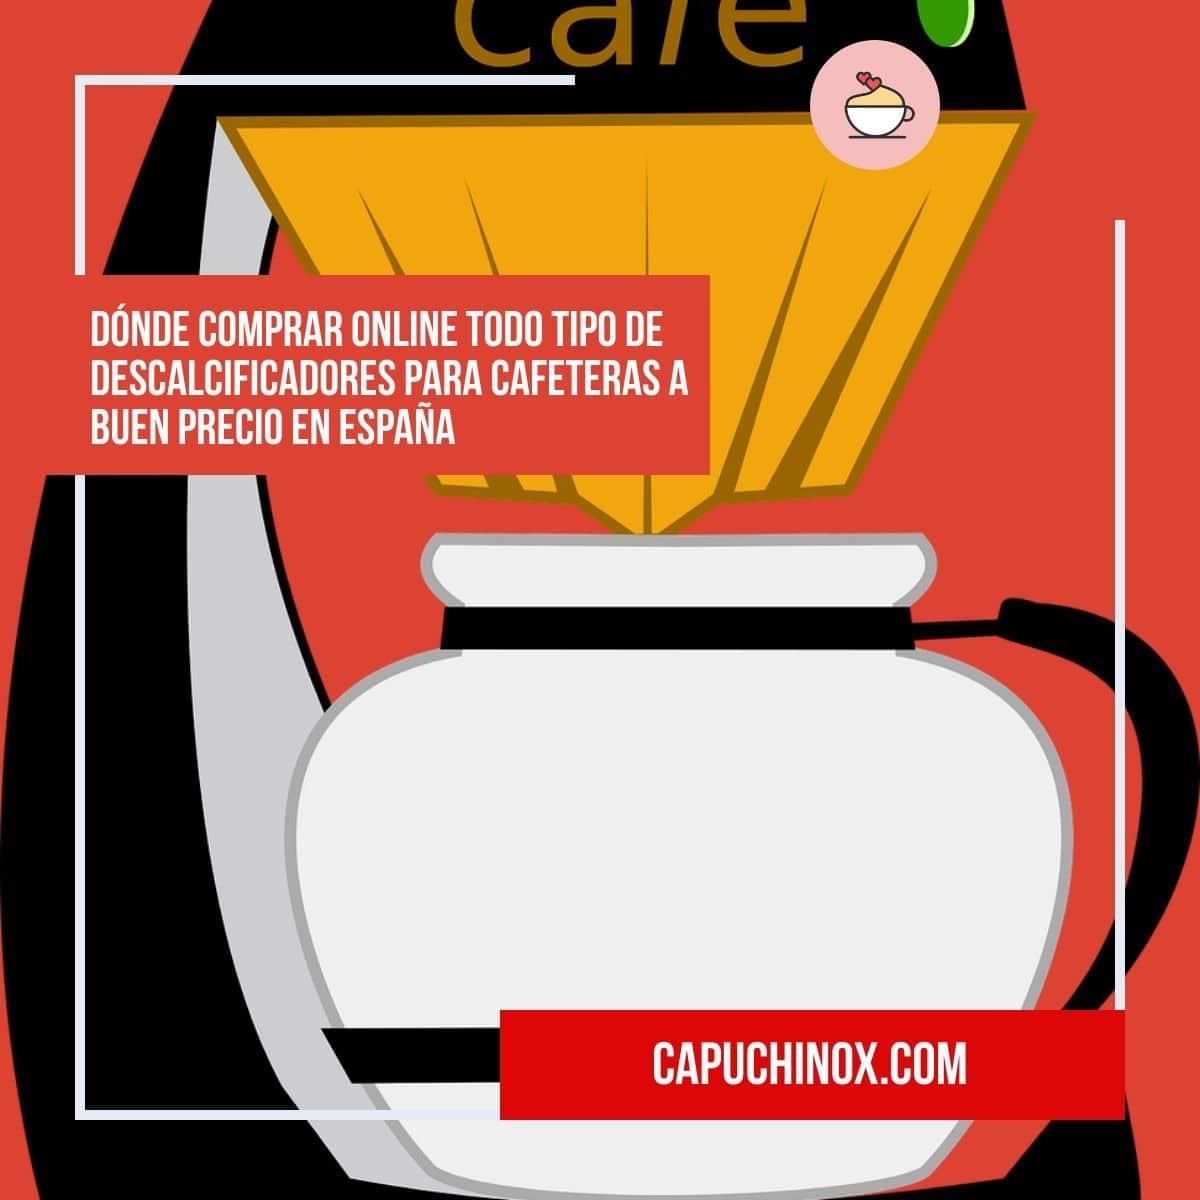 ¿Dónde podemos comprar online líquidos o pastillas descalcificadoras para cafeteras?